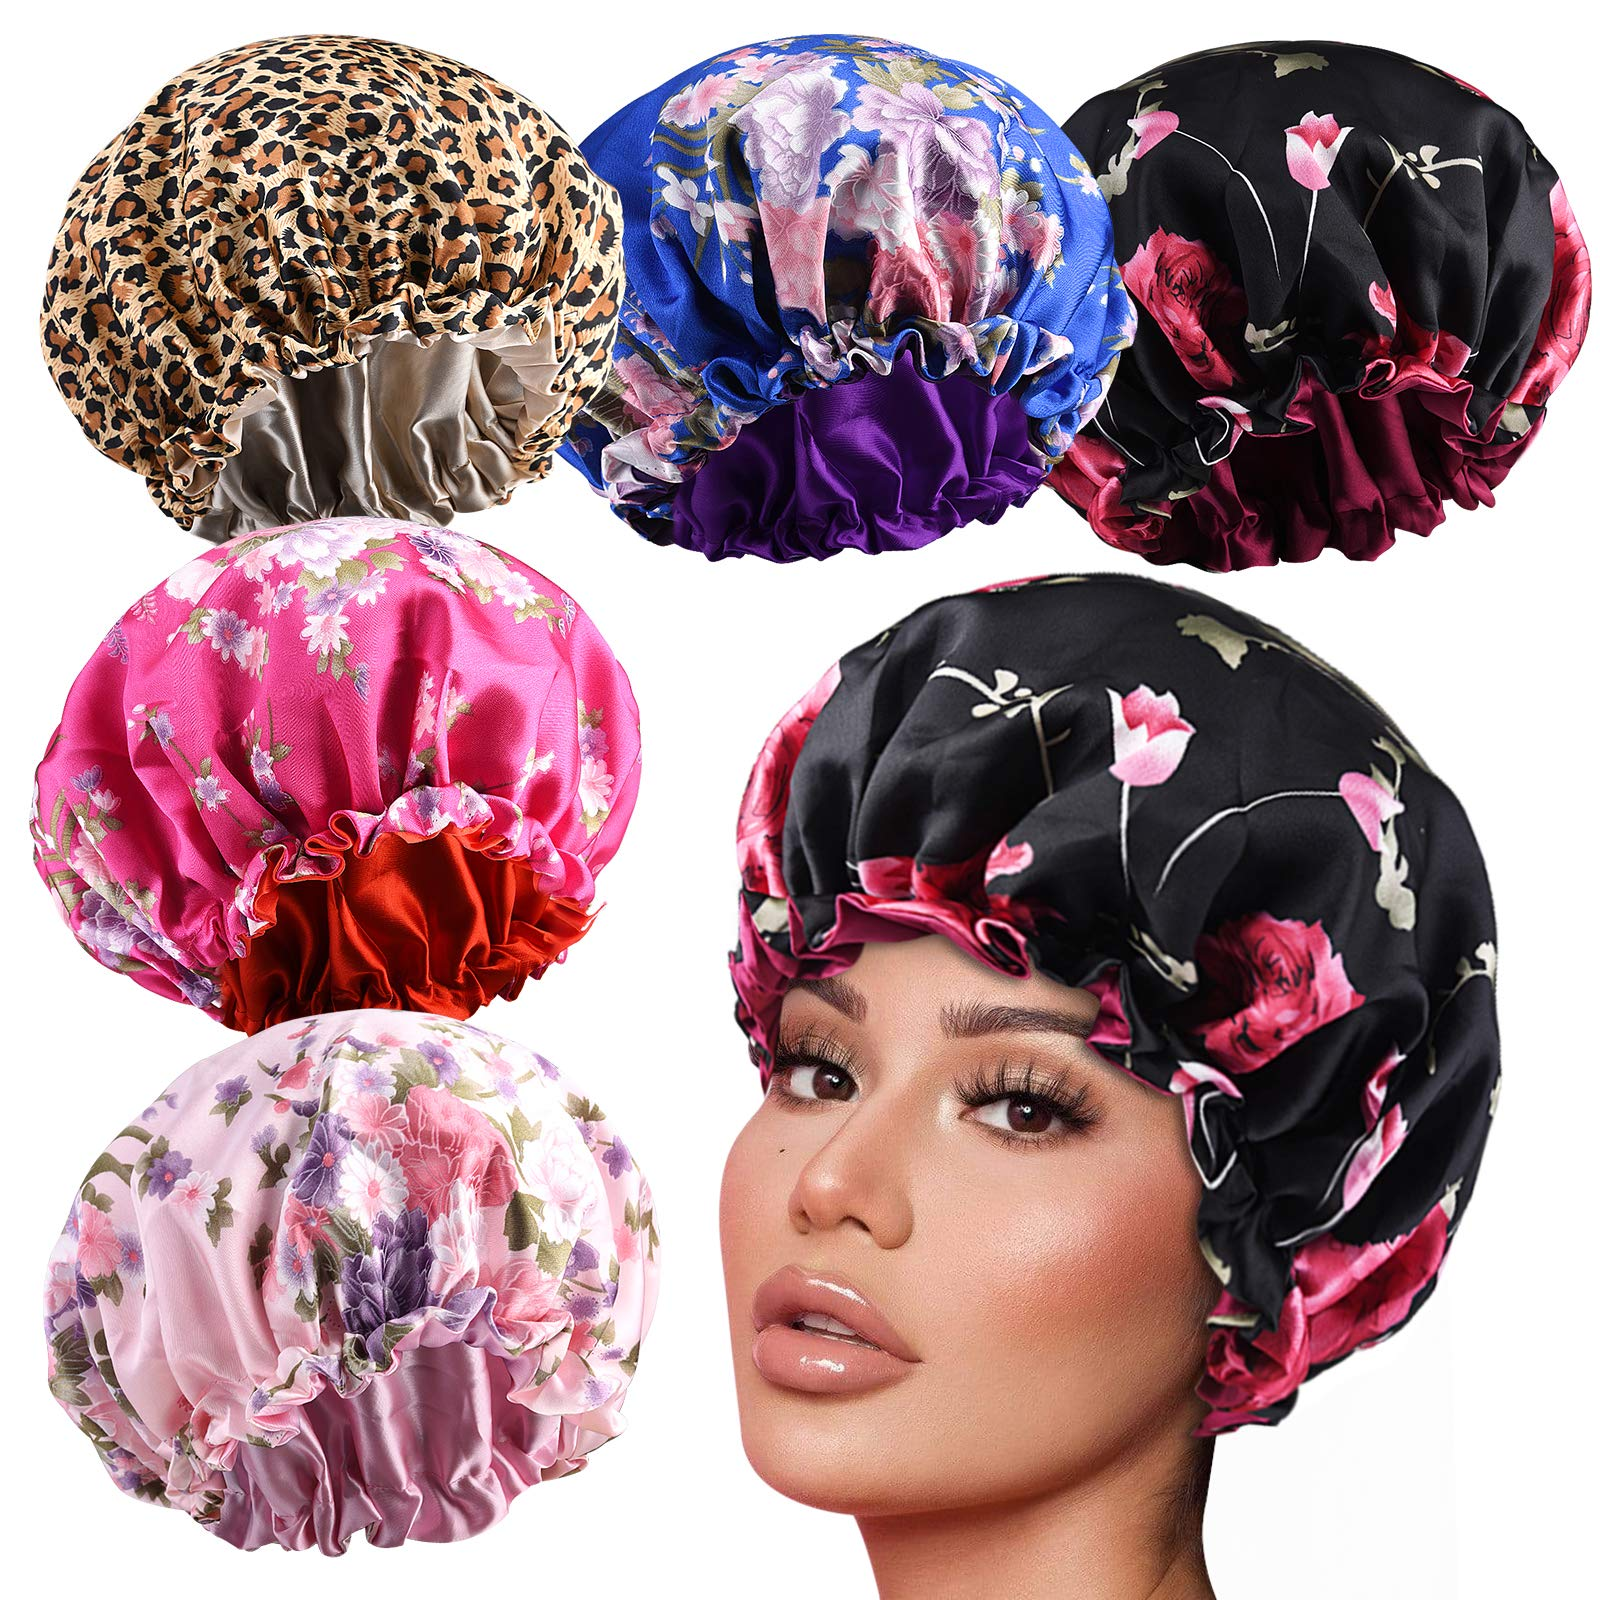 5pcs Drawstring Large Satin bonnet for Black Women Double Layer Reversible Silk